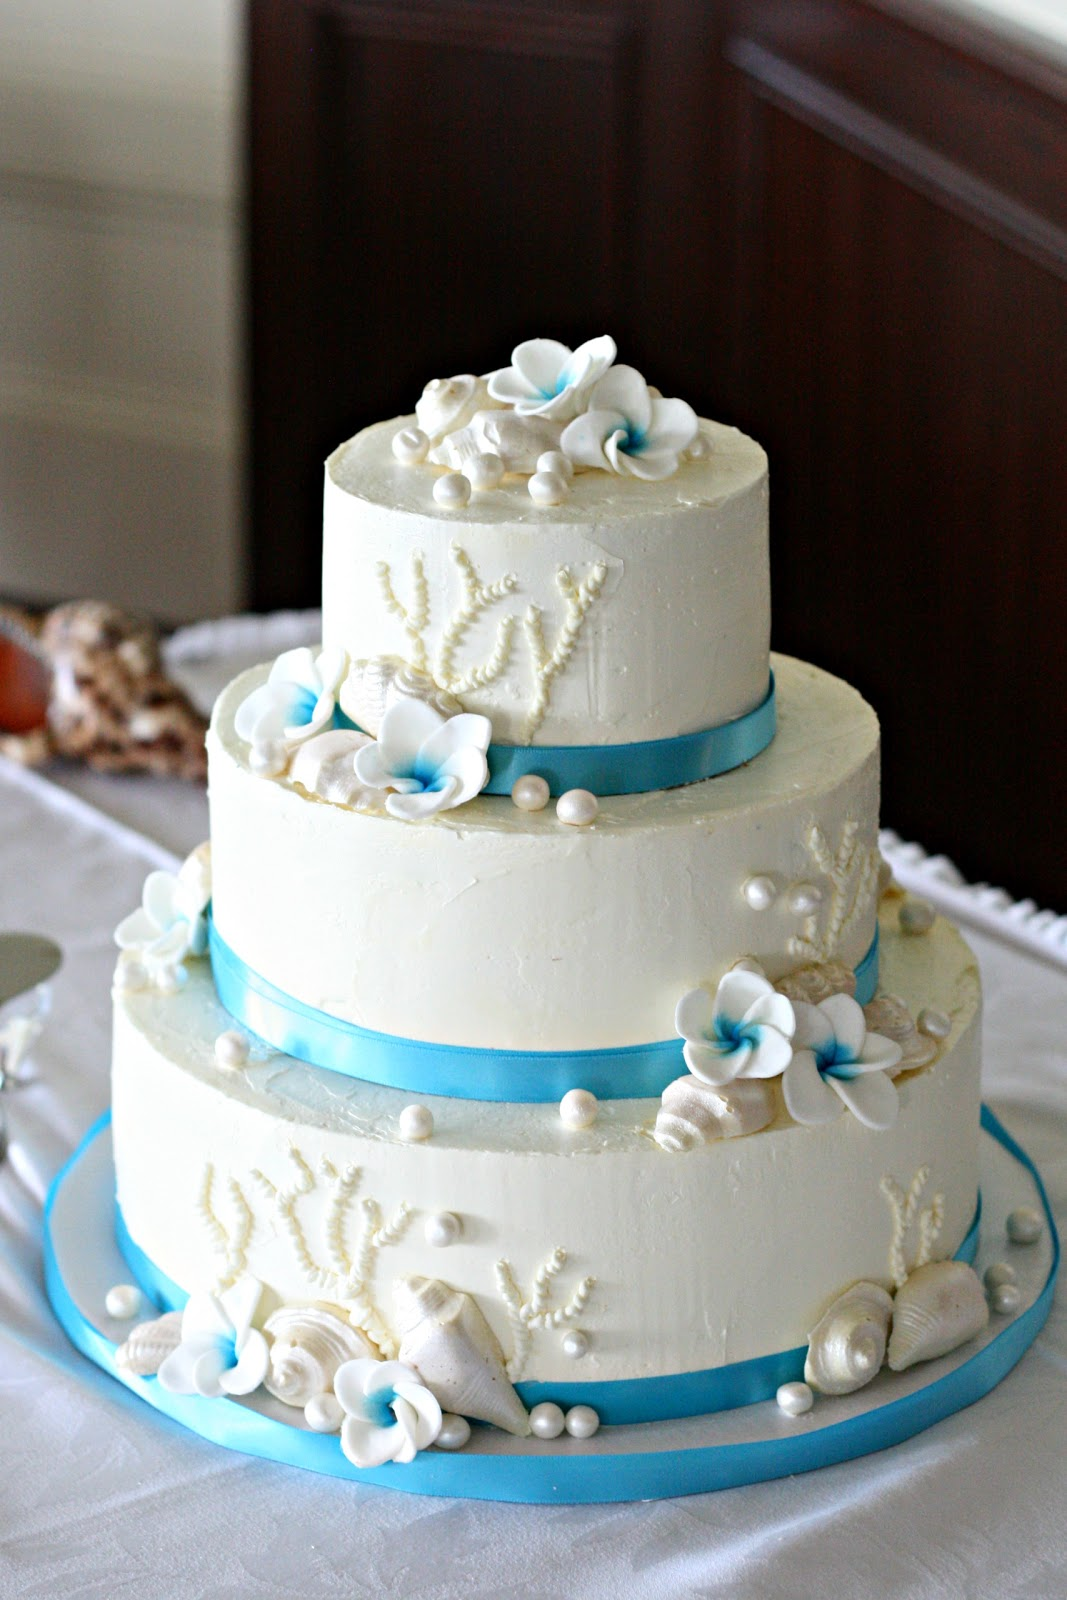 Sweet & Splendid beachy wedding edition